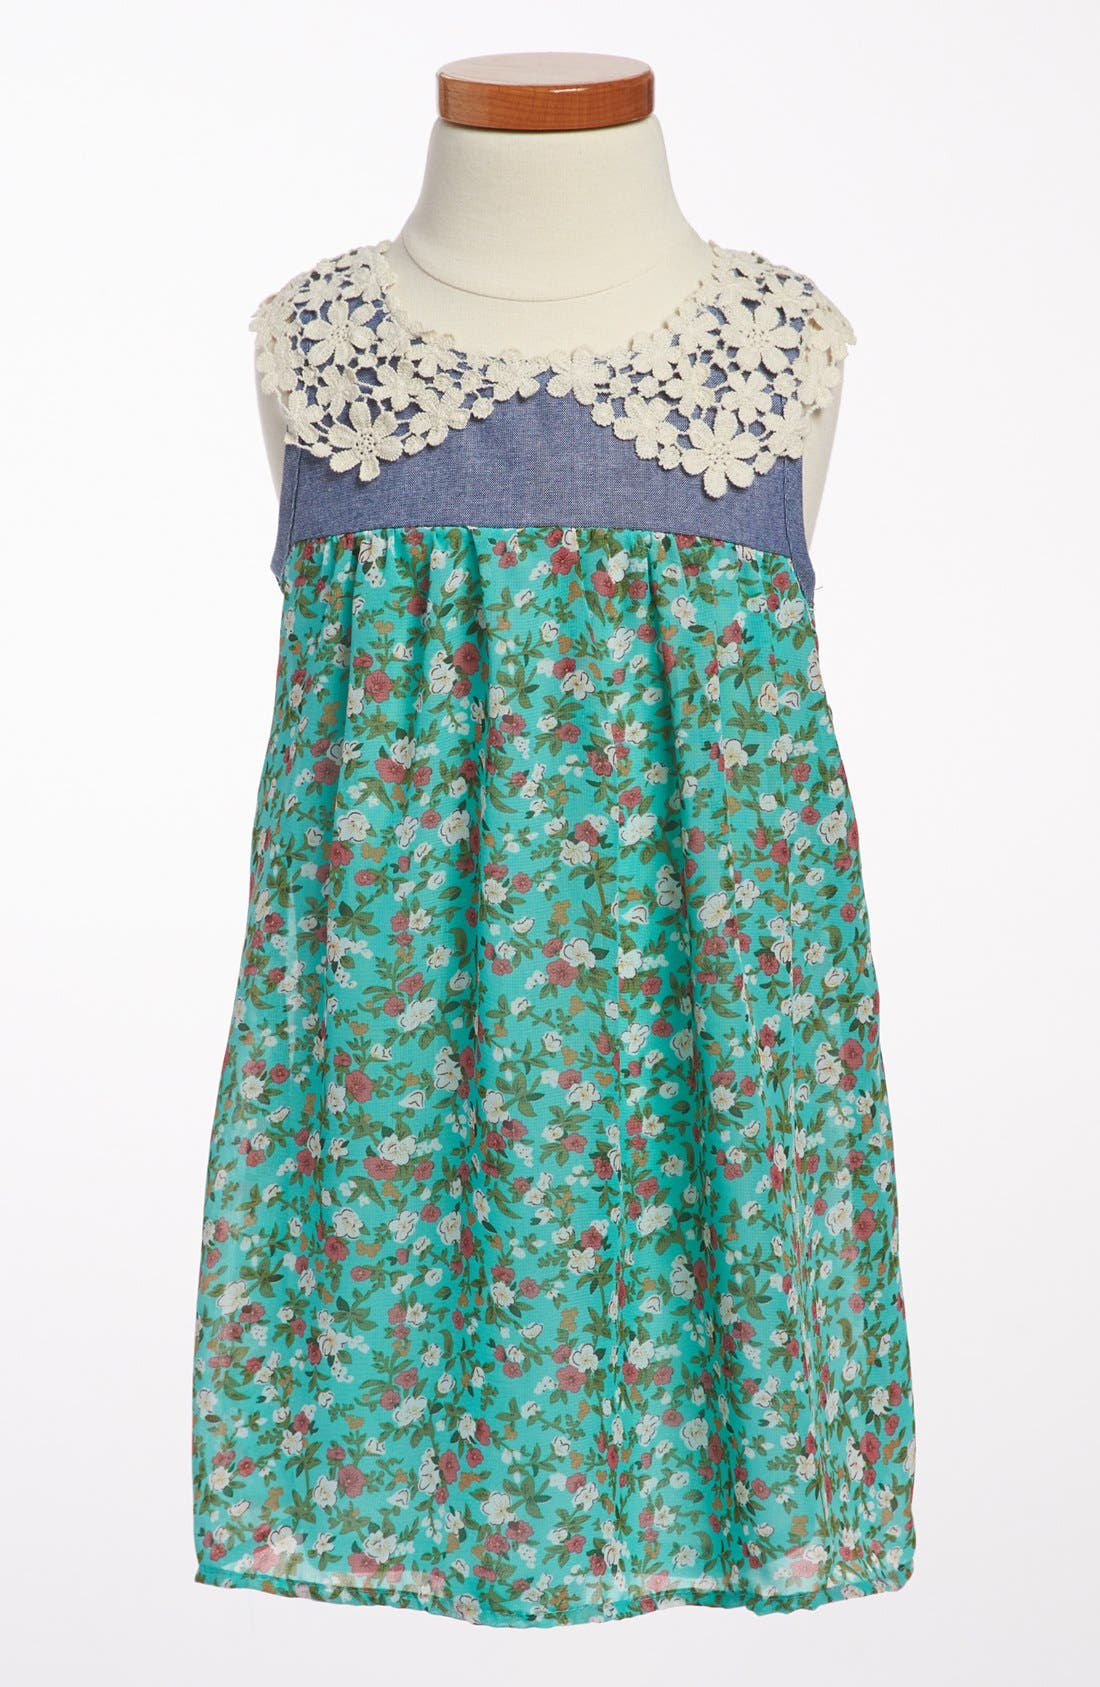 Main Image - Jenna & Jessie 'Ditsy Floral' Chiffon Dress (Toddler Girls)